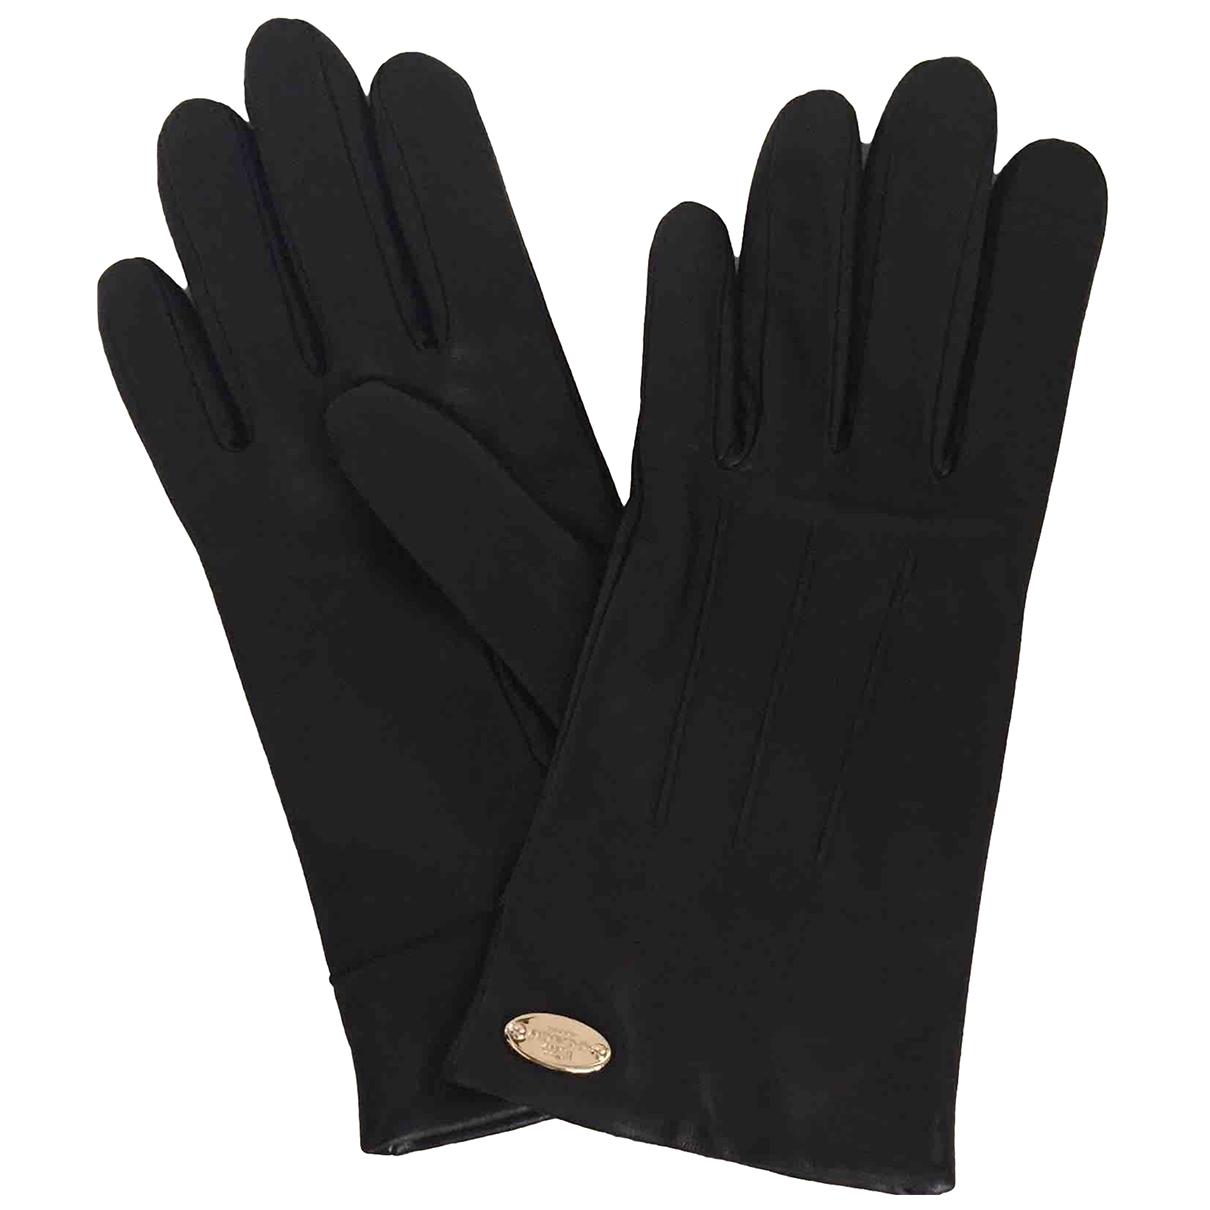 Coach \N Black Leather Gloves for Women S International